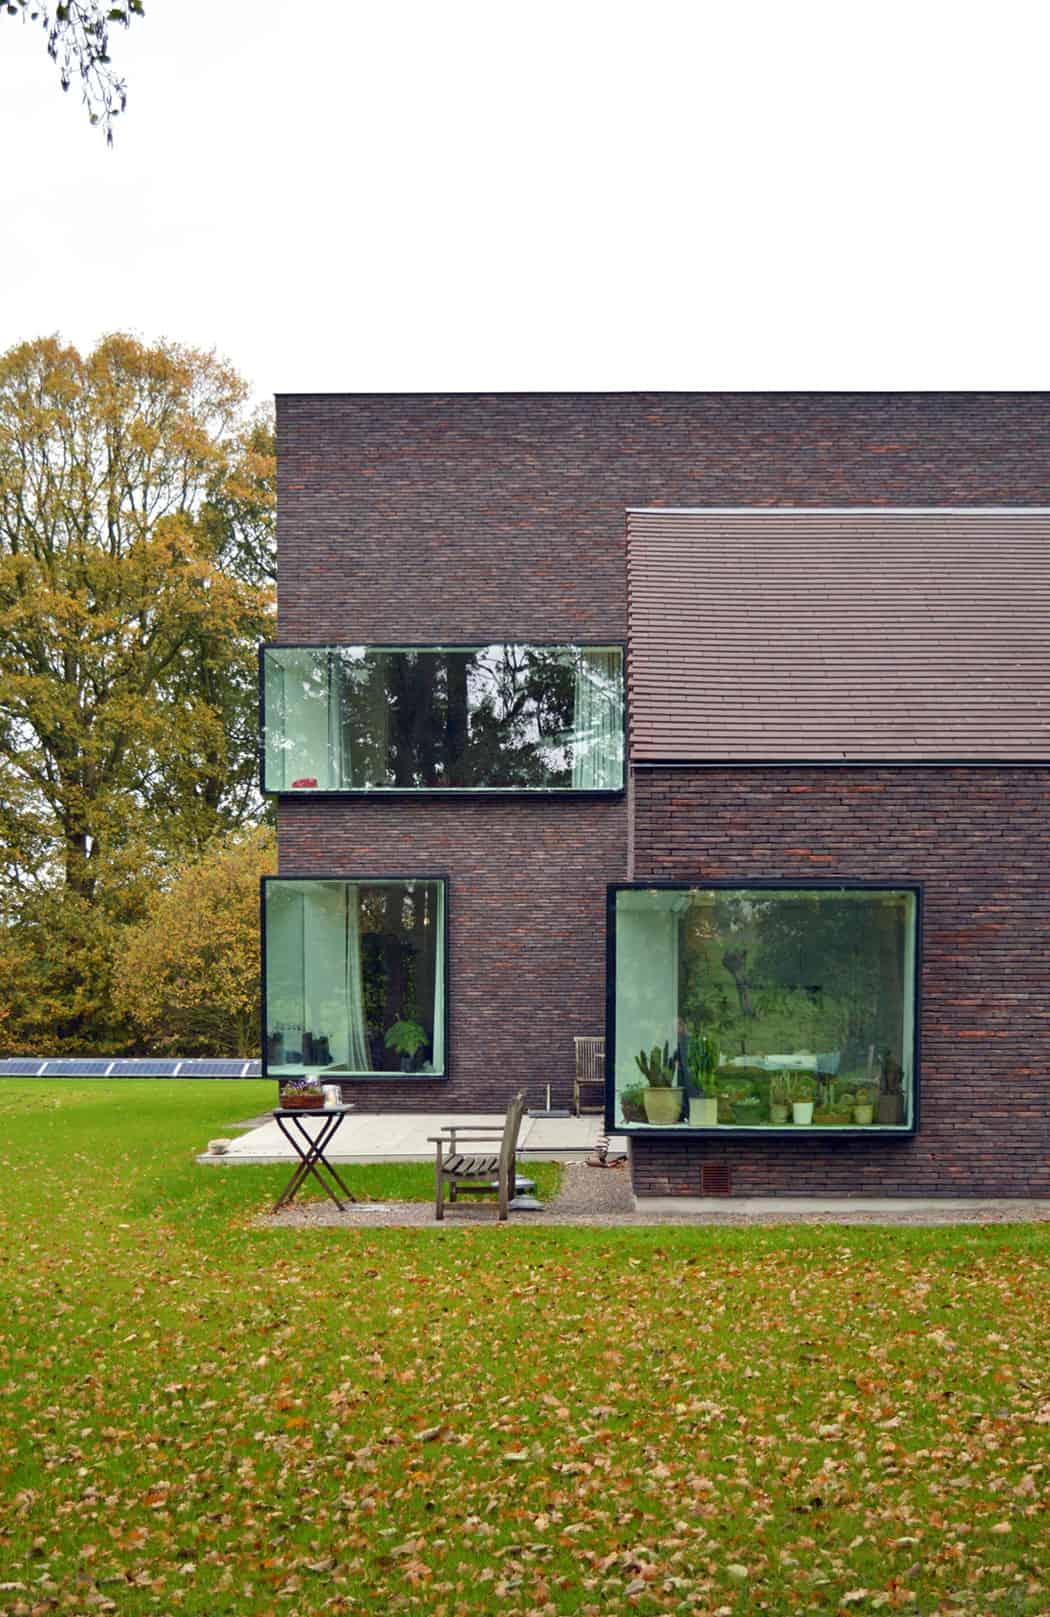 F&C Kiekens by Architektuurburo Dirk Hulpia (7)